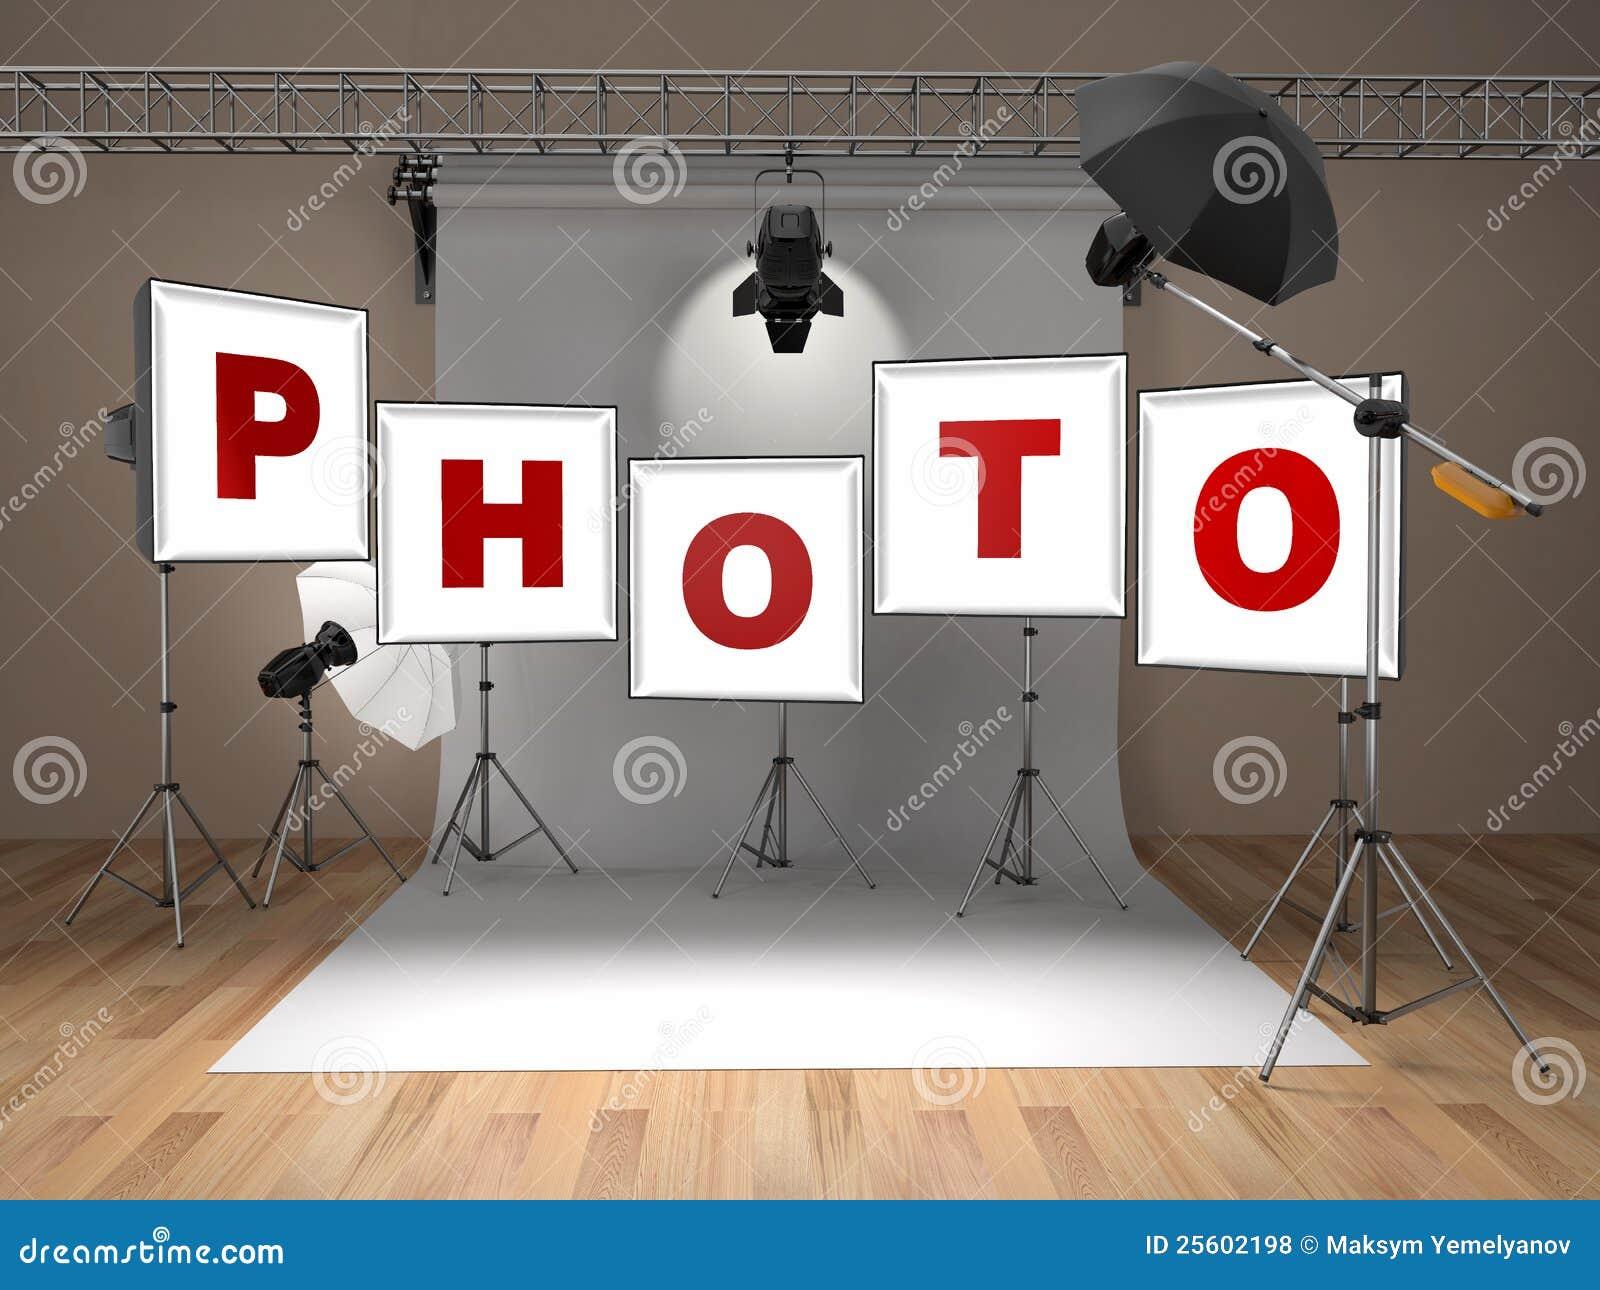 astronomy photography equipment - photo #28